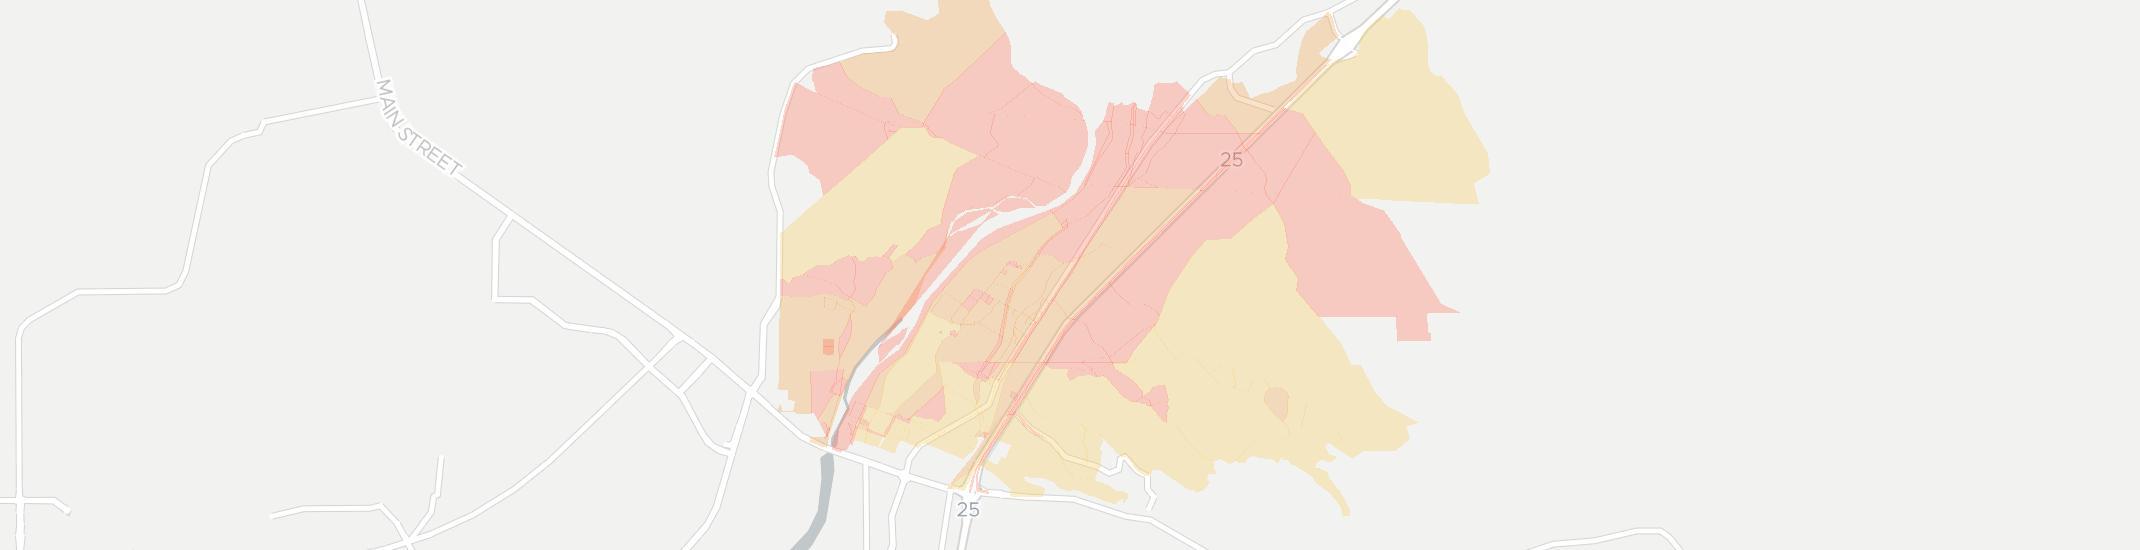 Santa Ana Pueblo Internet Competition Map. Click for interactive map.